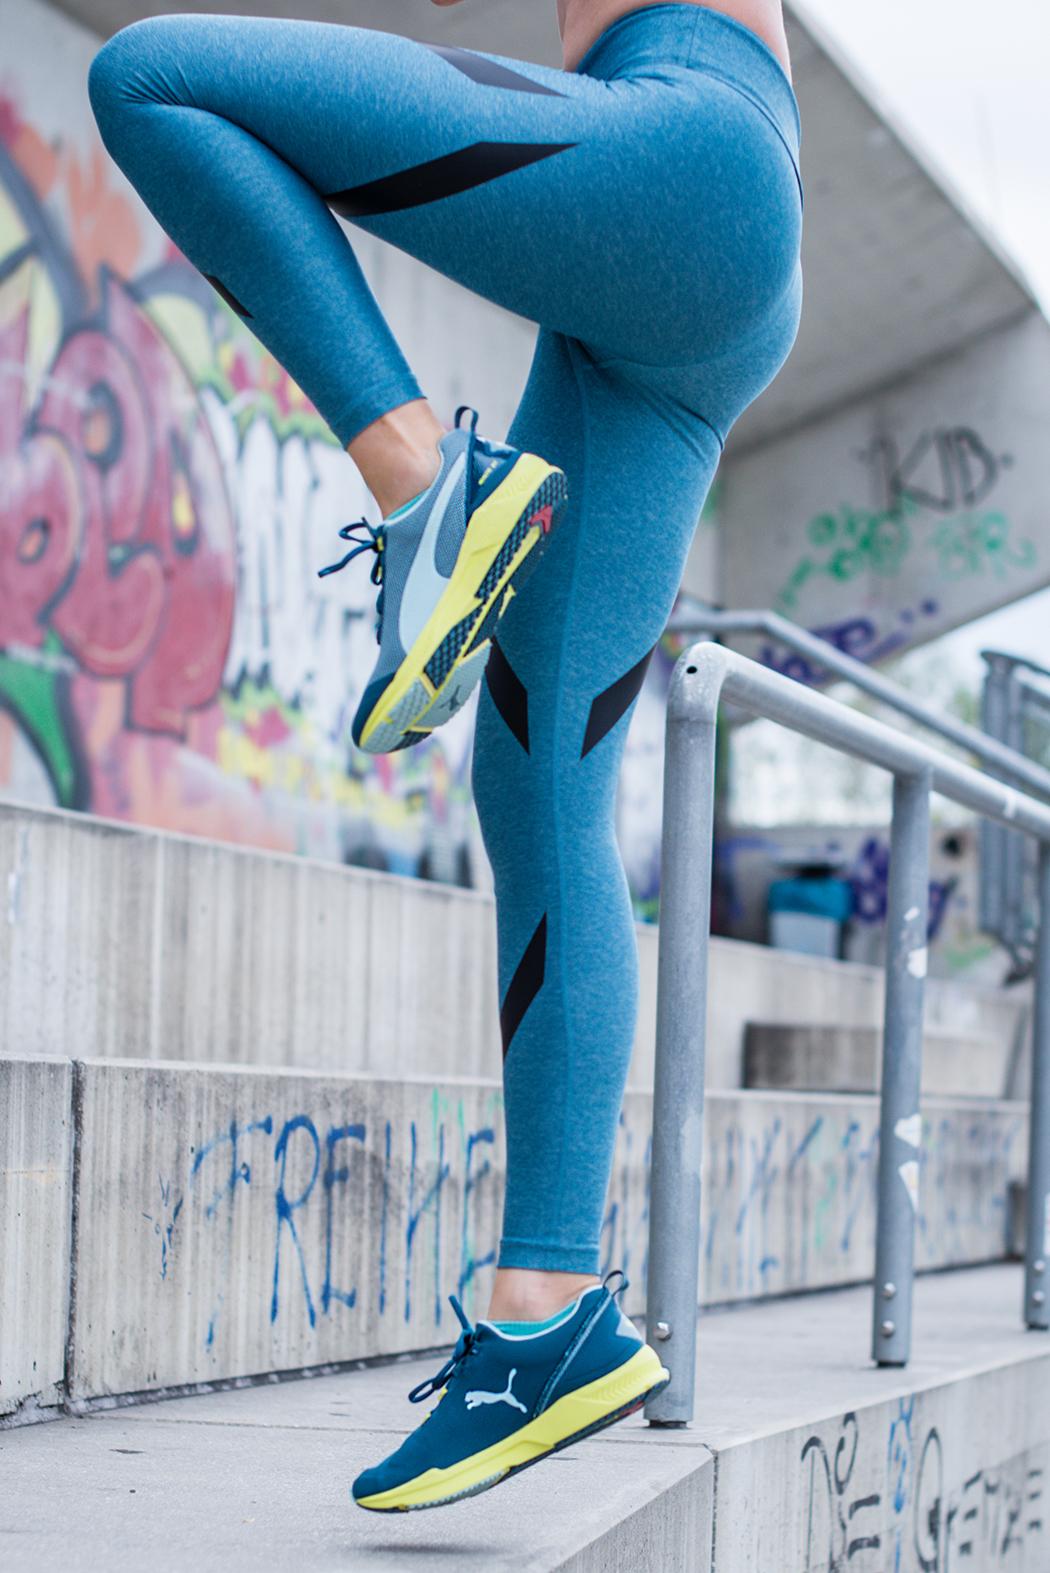 Fitnessblog-Fitnessblogger-Fitness-Blog-Sport-Blogger-Lifestyle-Puma-Ignite-Rihanna-Lindarella-Linda-Rella-München-Deutschland-5-web